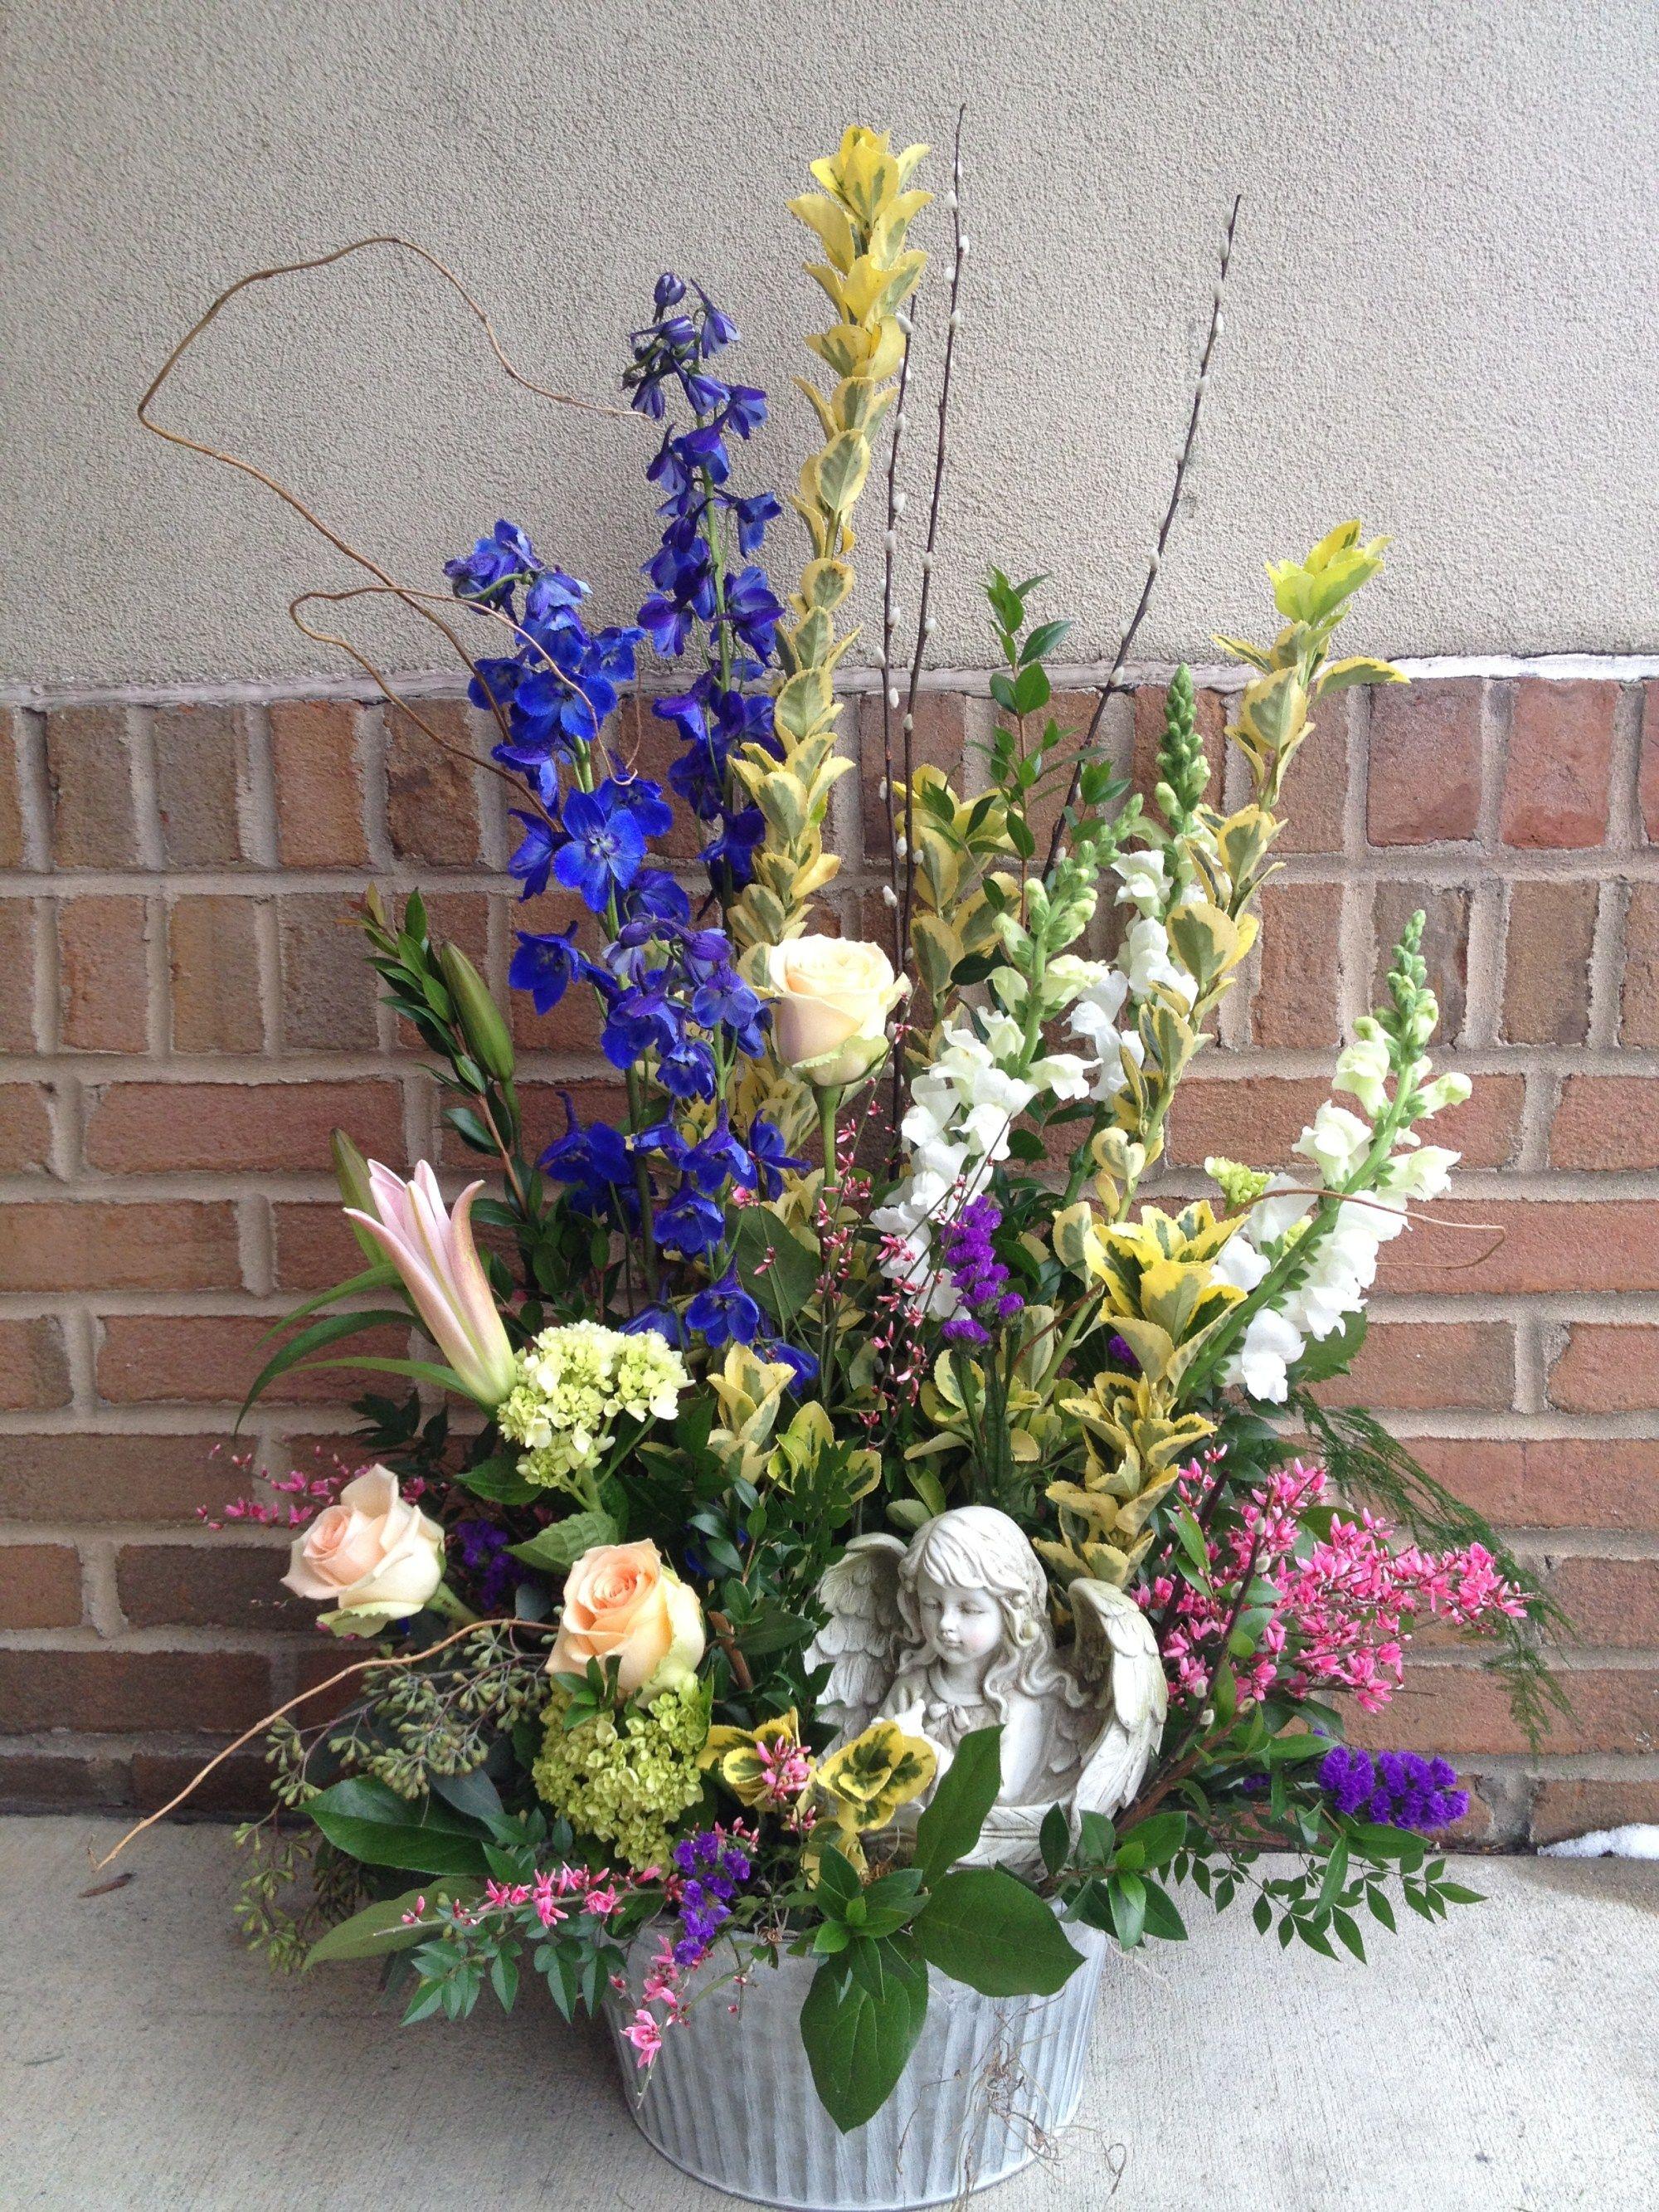 Sympathy Designs Art In Bloom Studio In 2020 Sympathy Flowers Casket Sprays European Garden